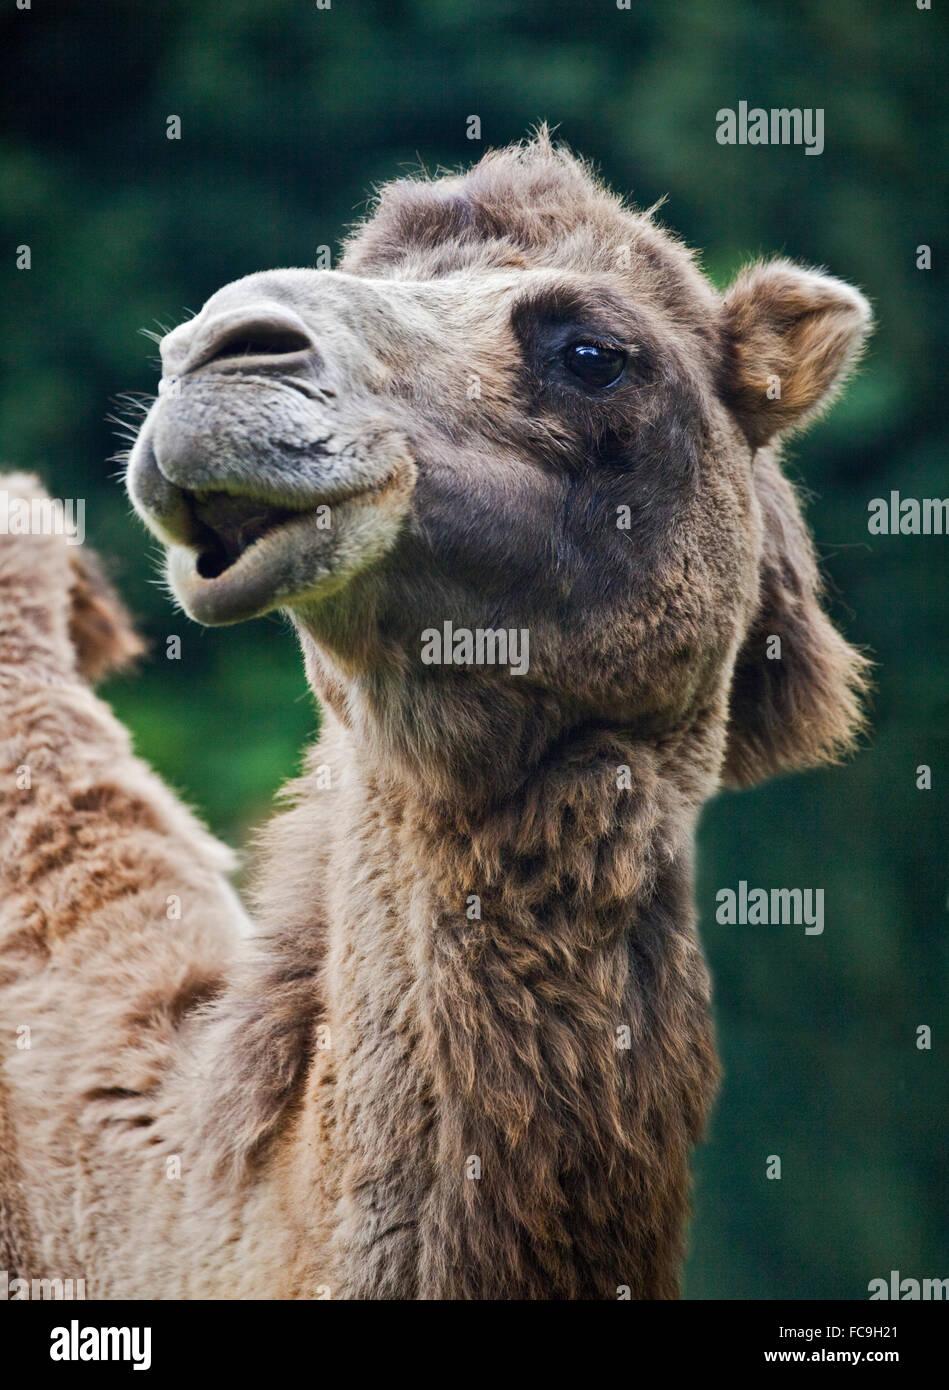 Bactrian Camel (camelus bactrianus) - Stock Image